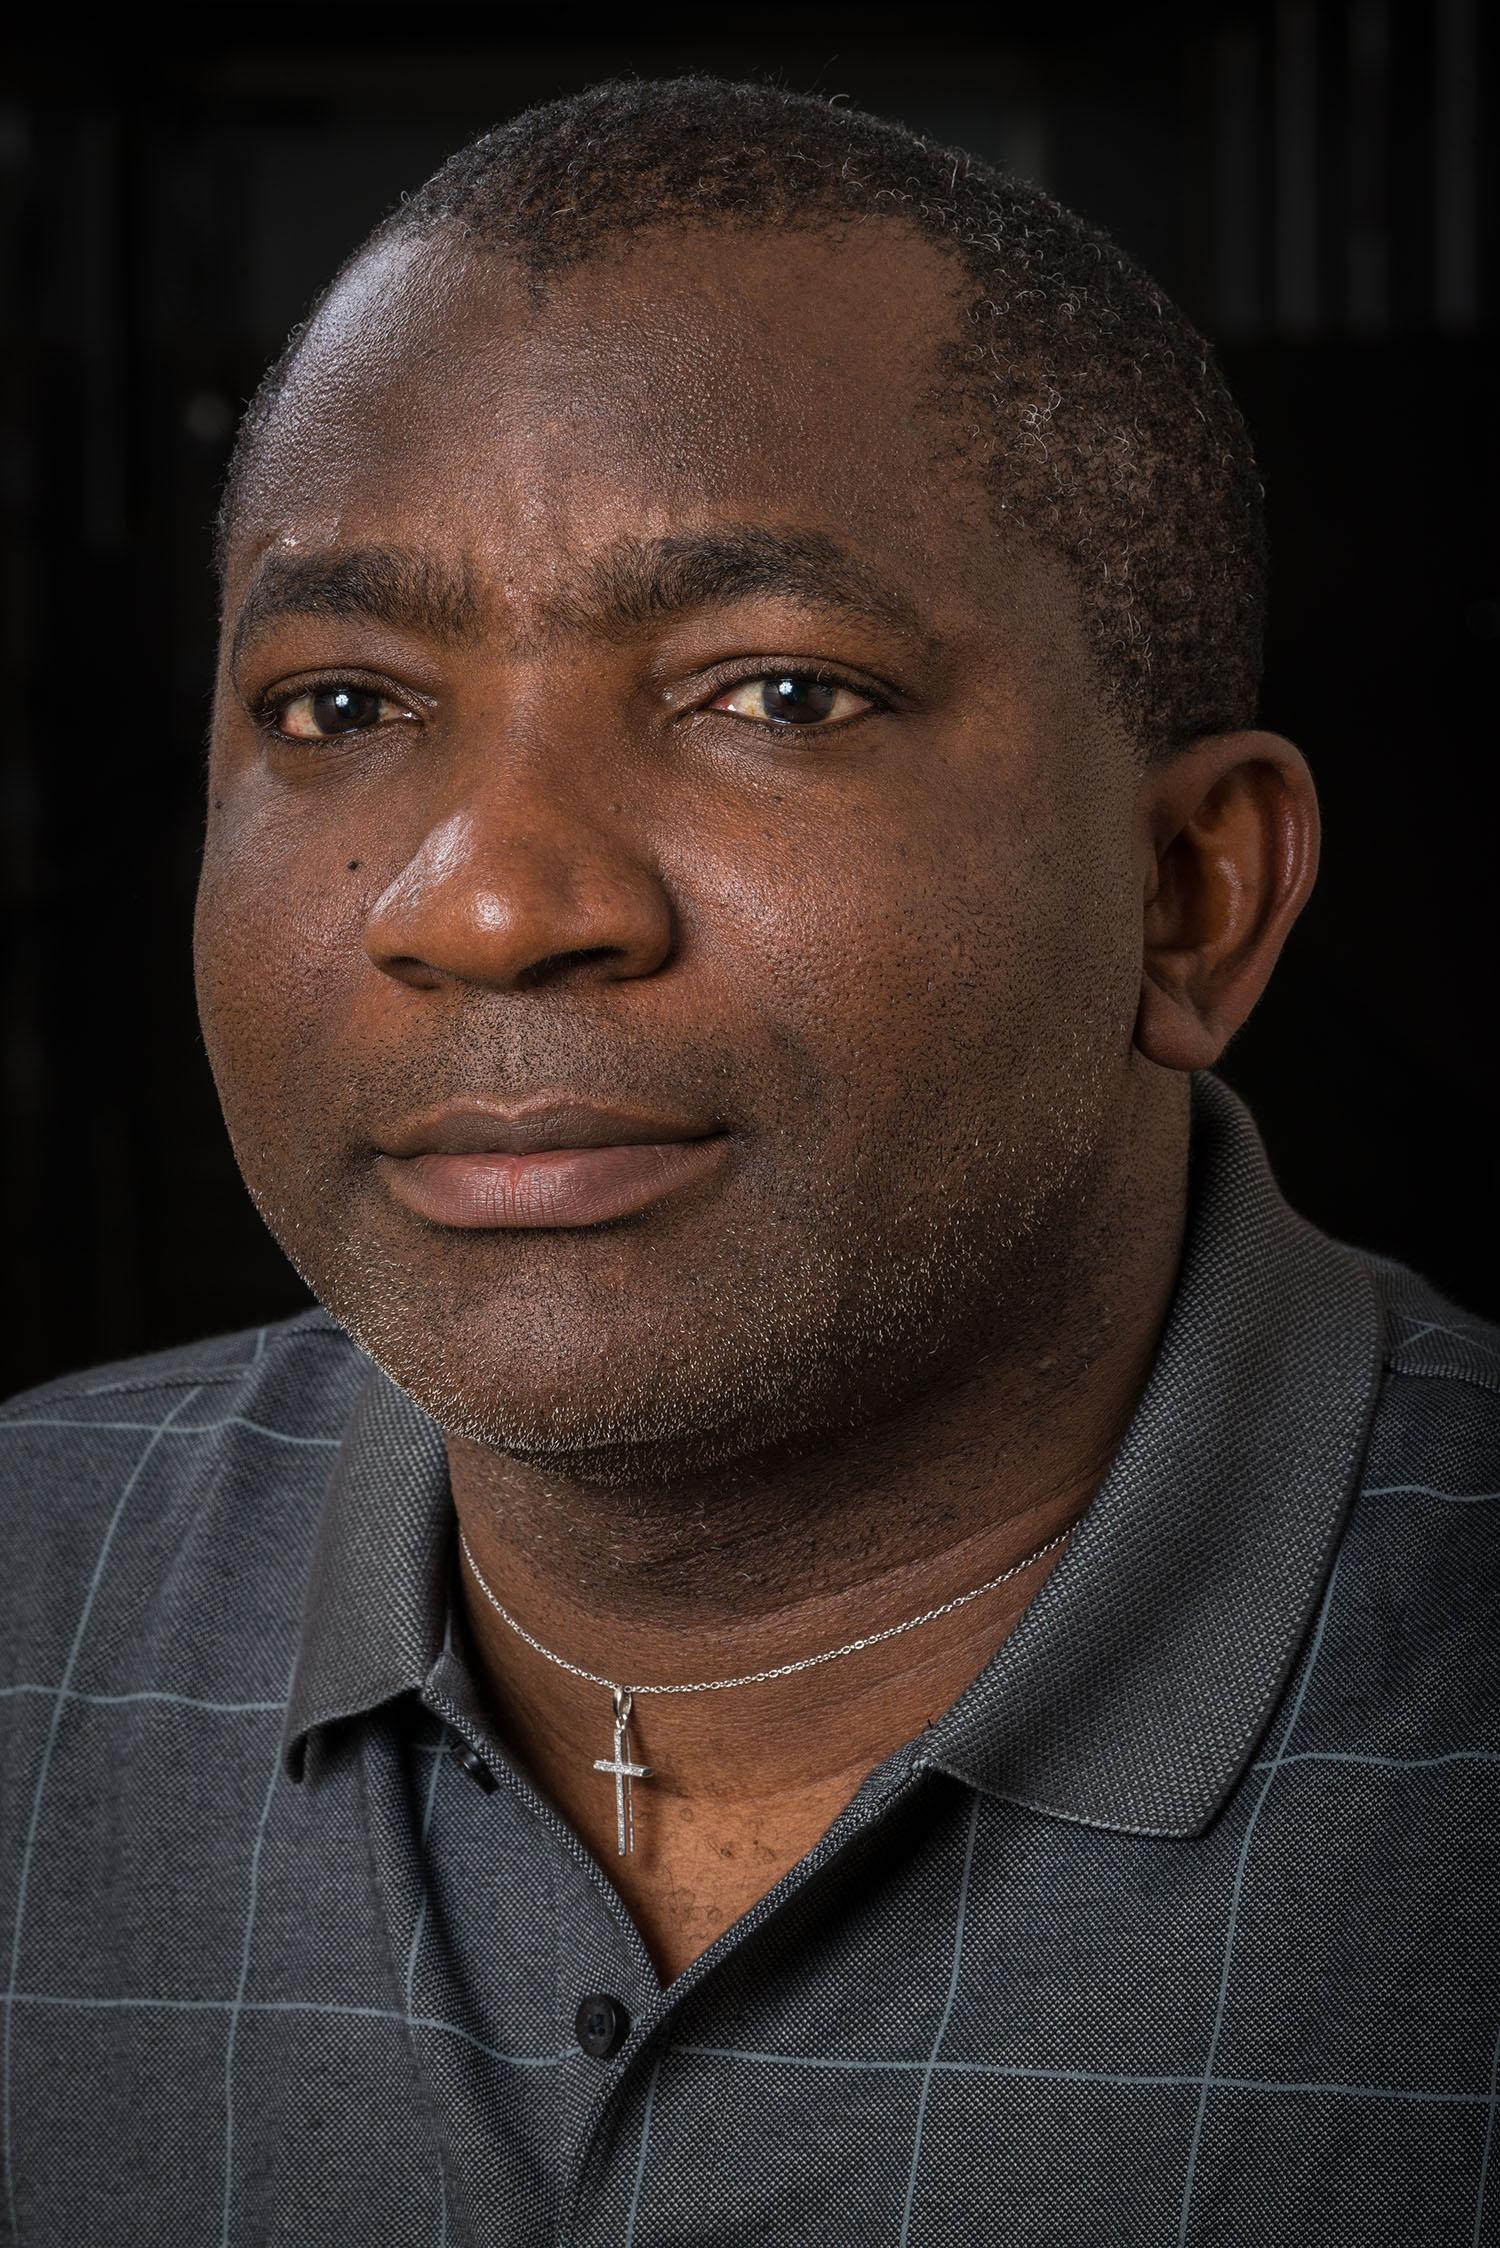 Gerald Nwafor